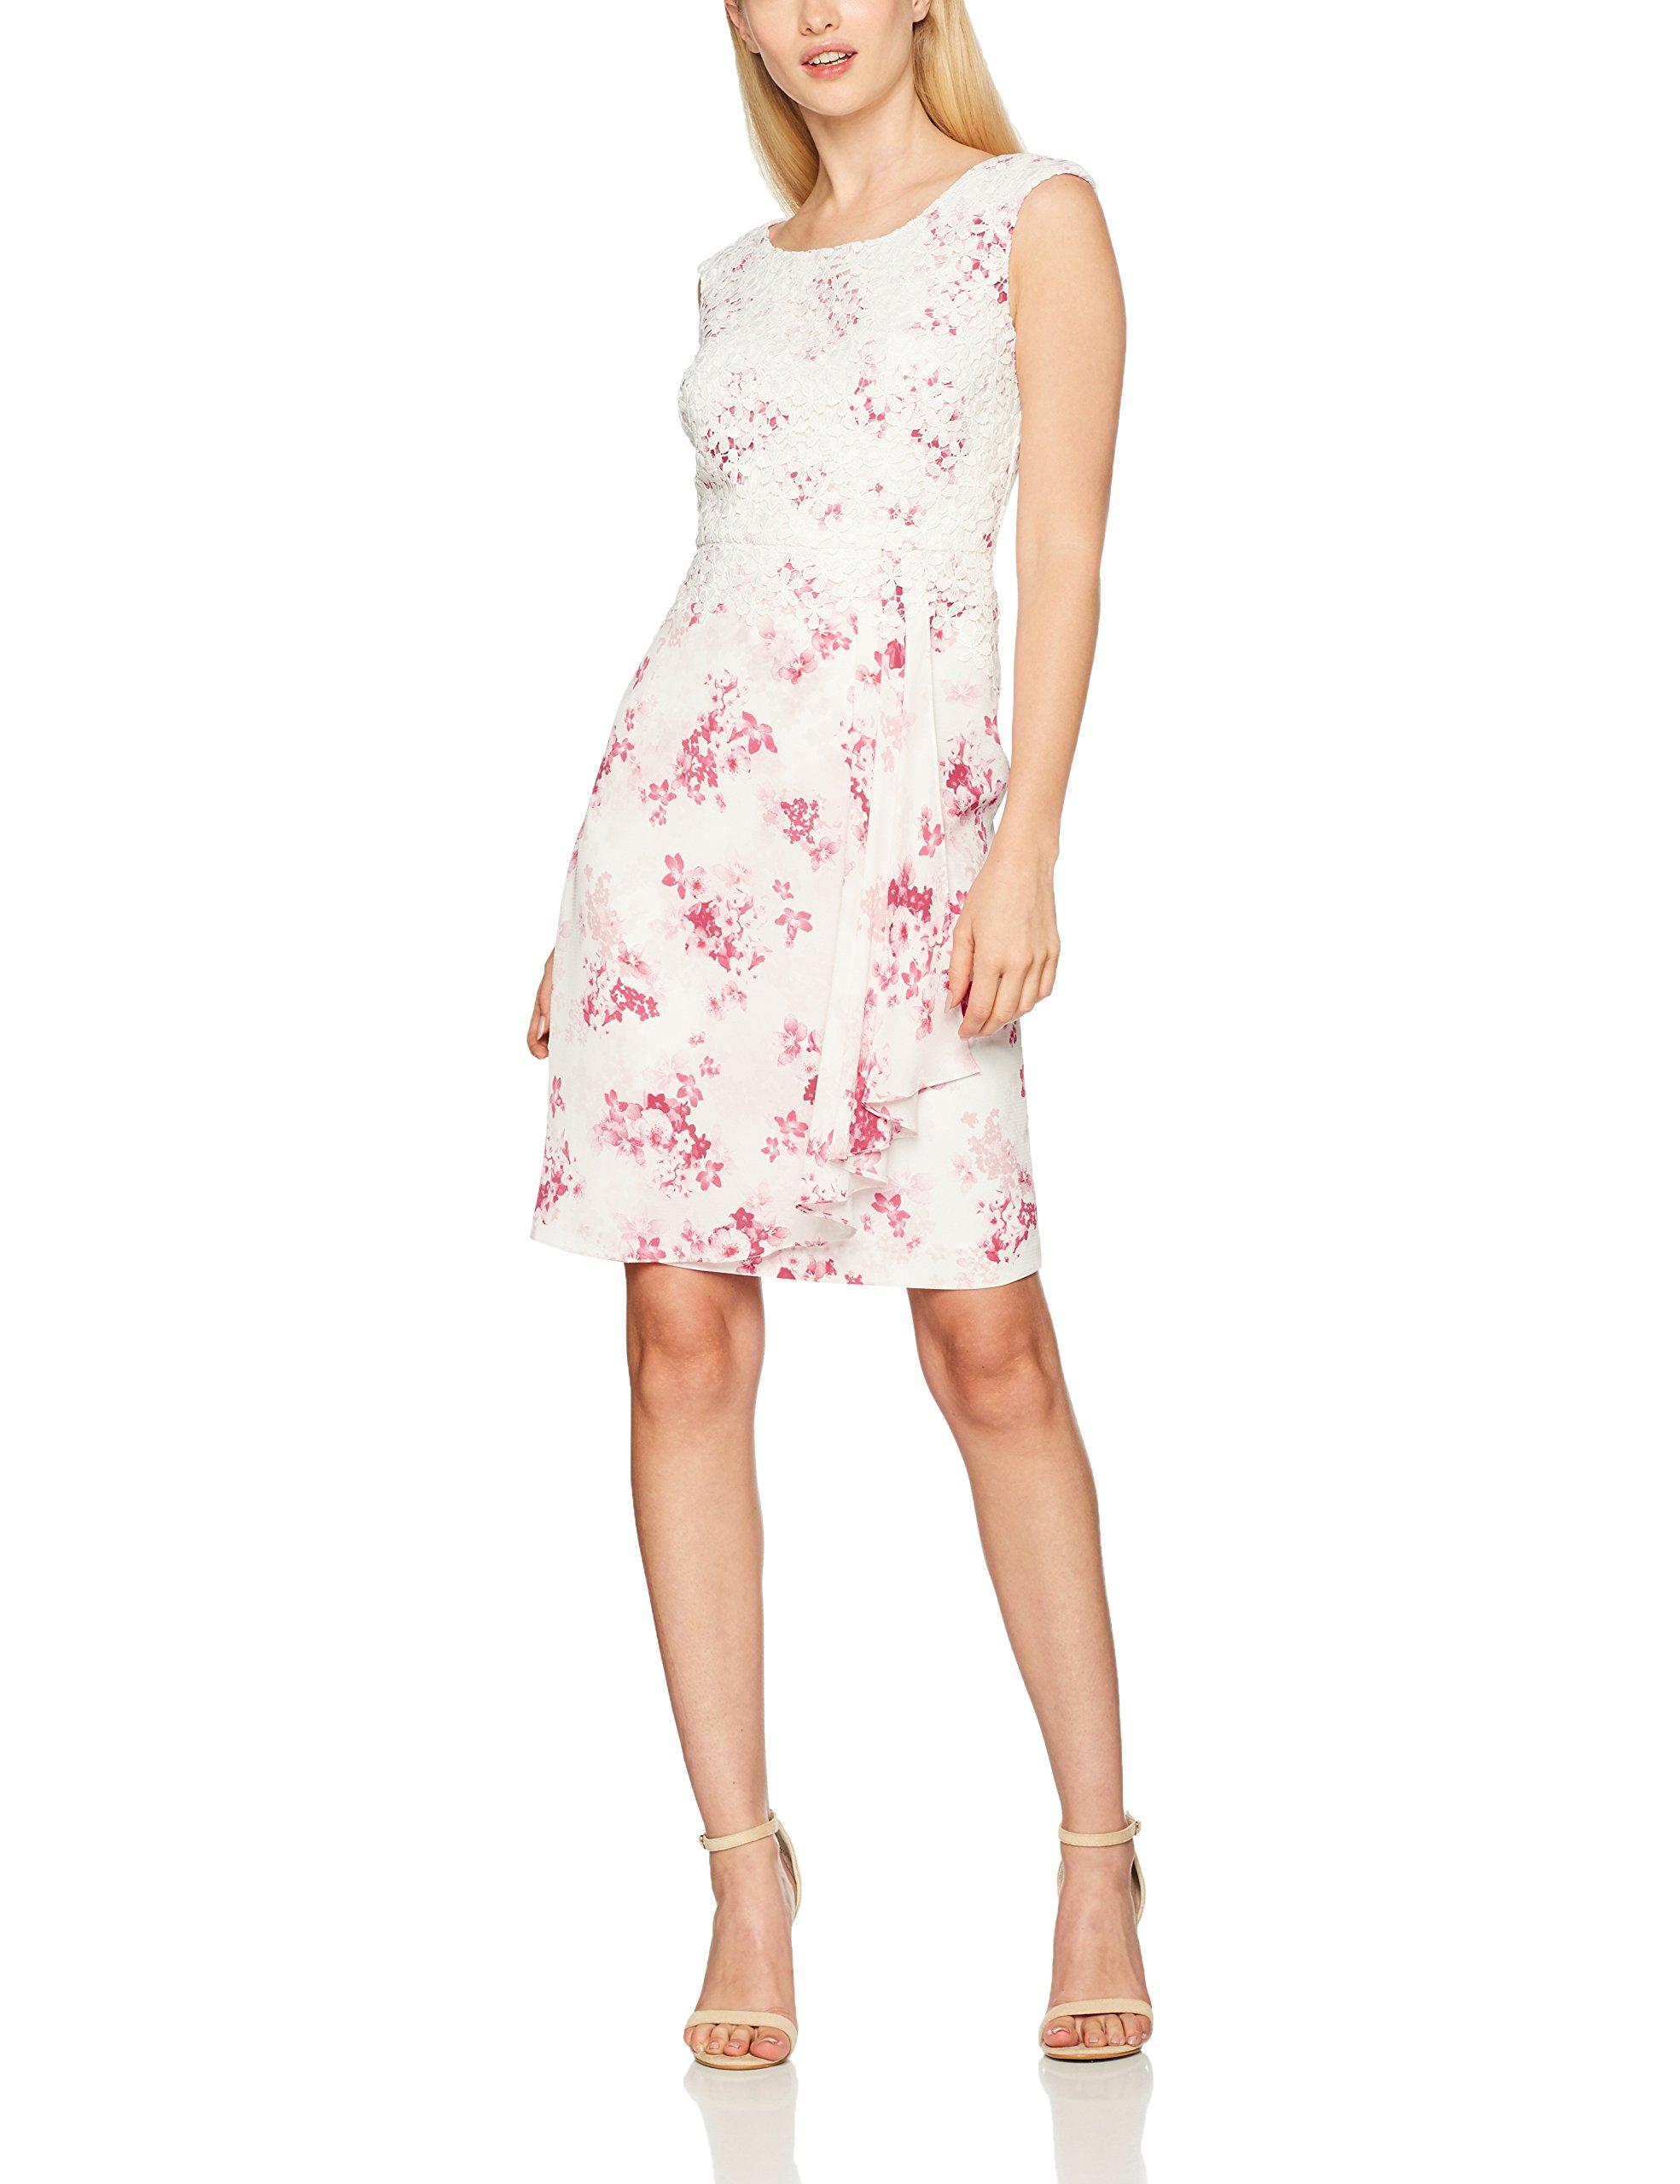 RobeMulticoloremulticoloured And Lace Jacques Petite Flower 4543635546 Vert Femme PXZikuO